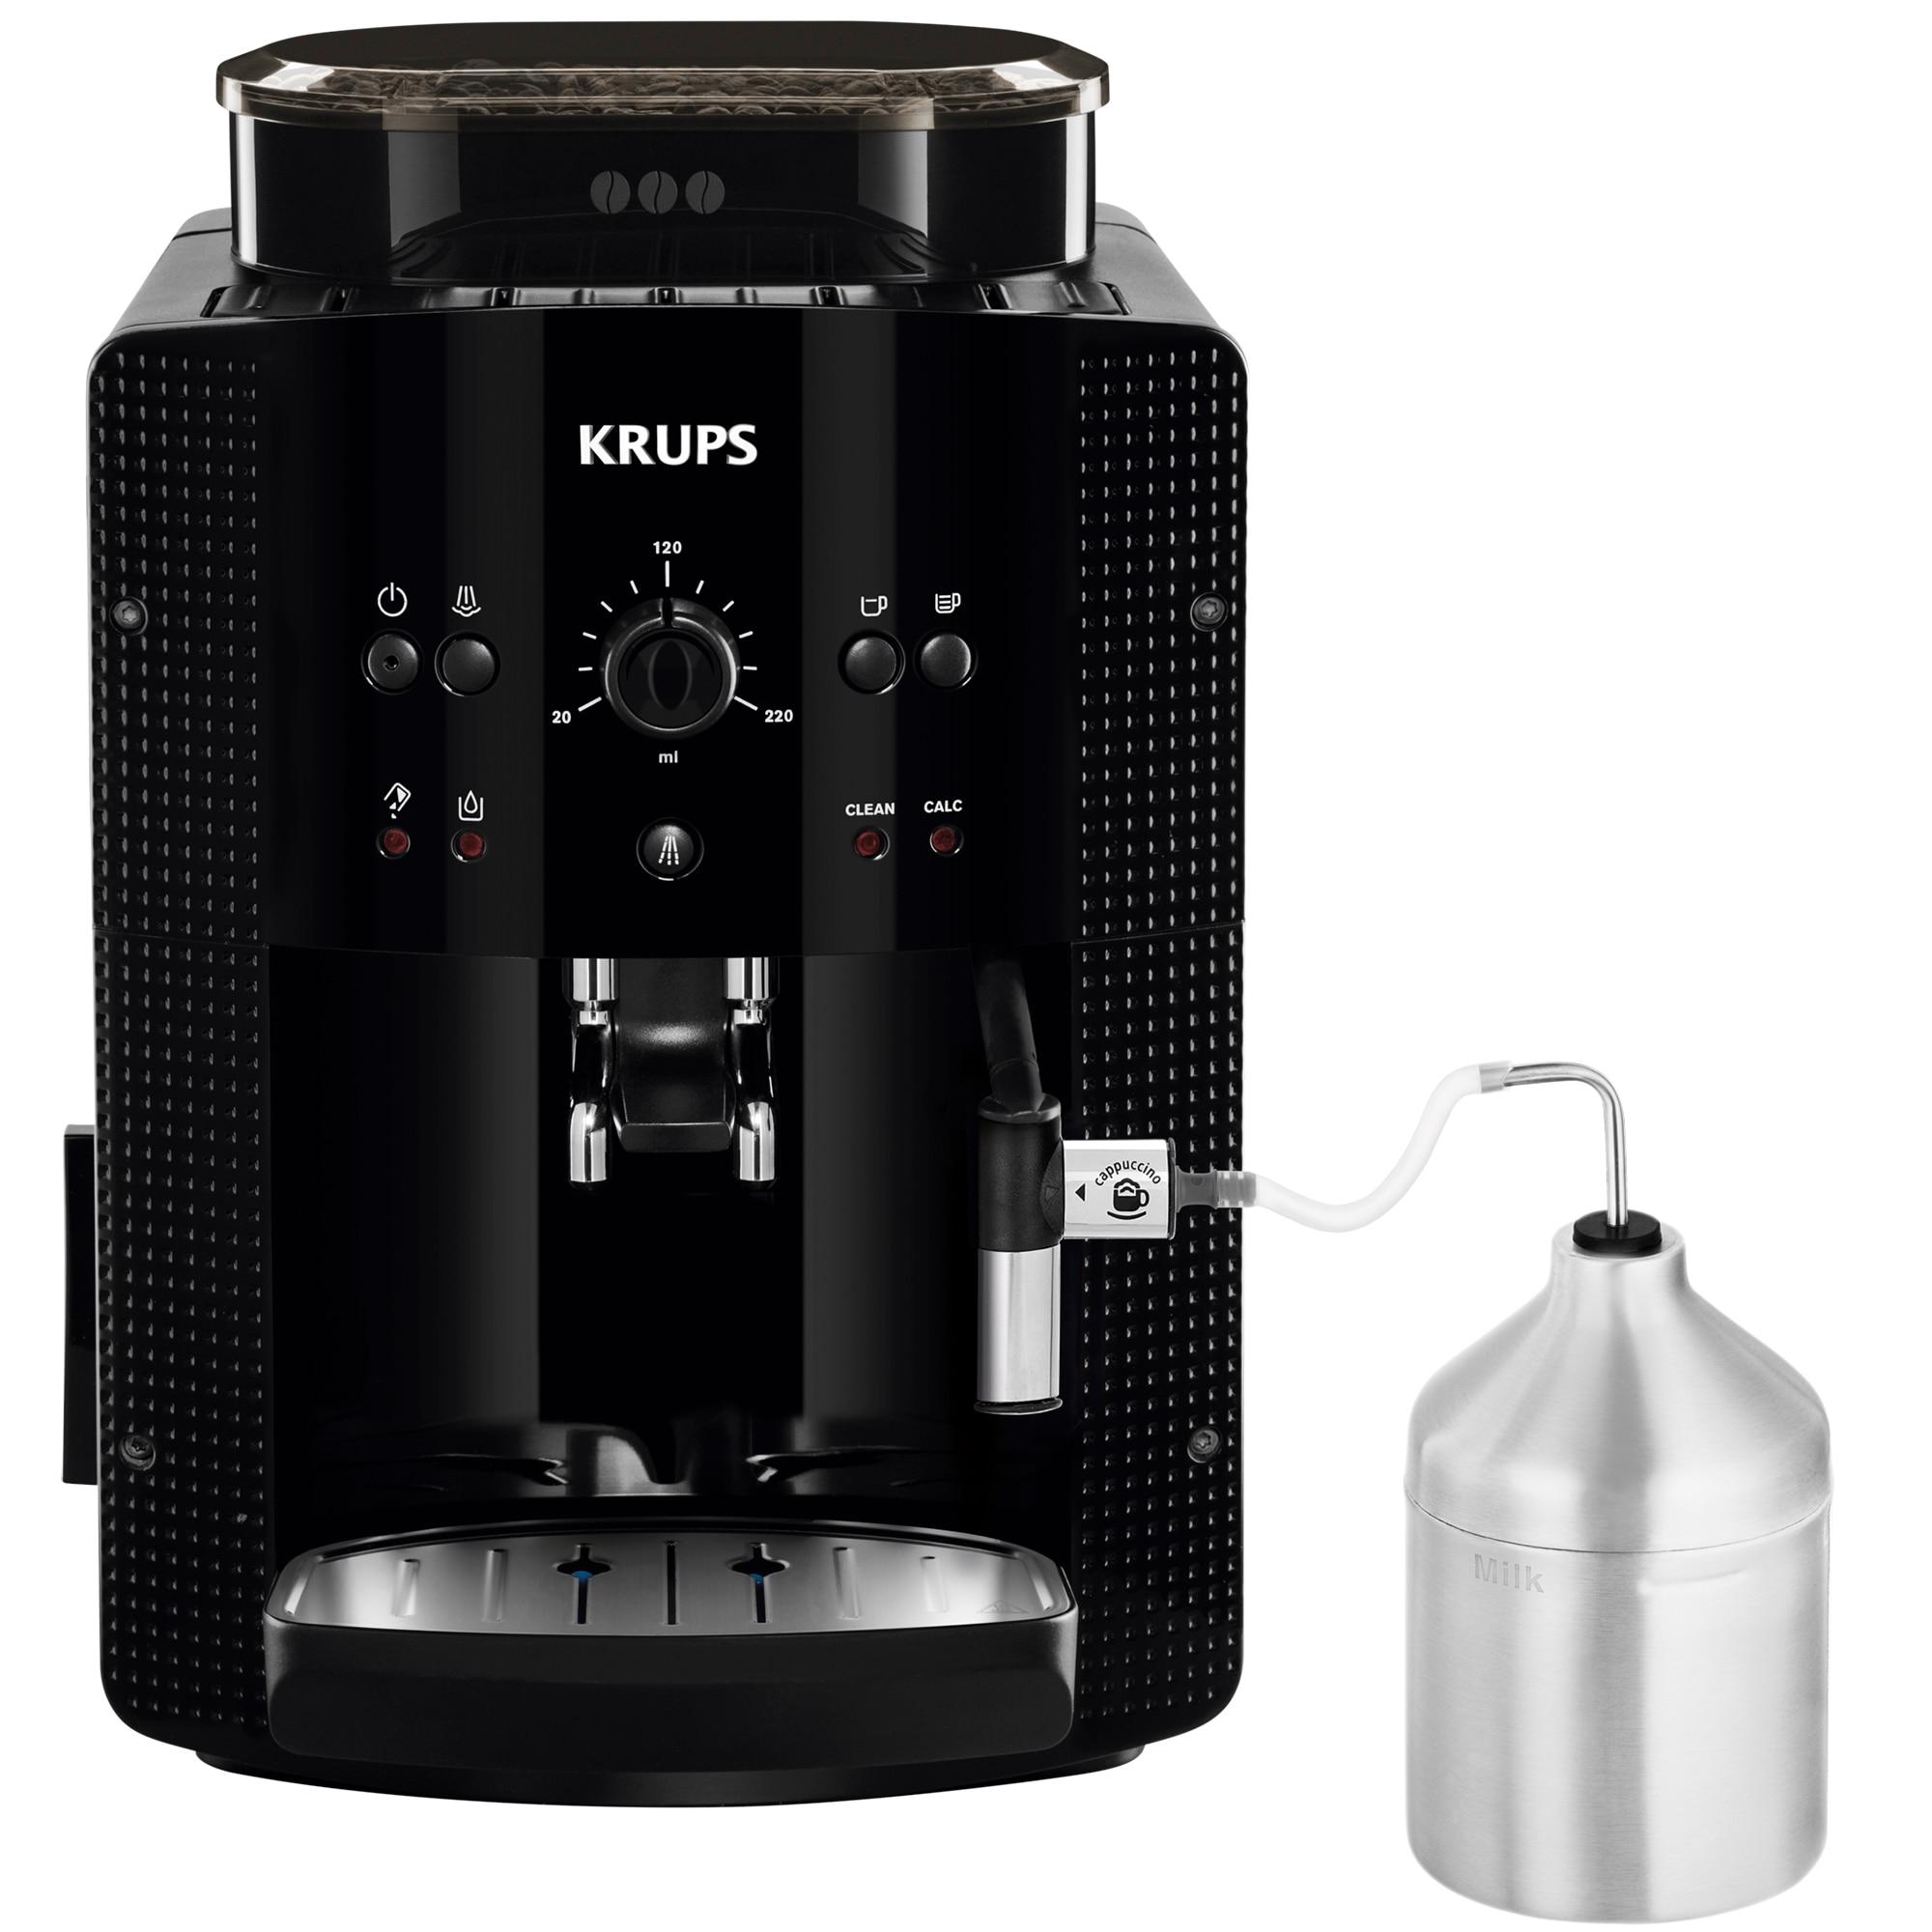 Fotografie Espressor Krups EA81M870 Essential, 1450 W, 15 bar, Recipient Lapte, rasnita metal, Thermoblock, Negru